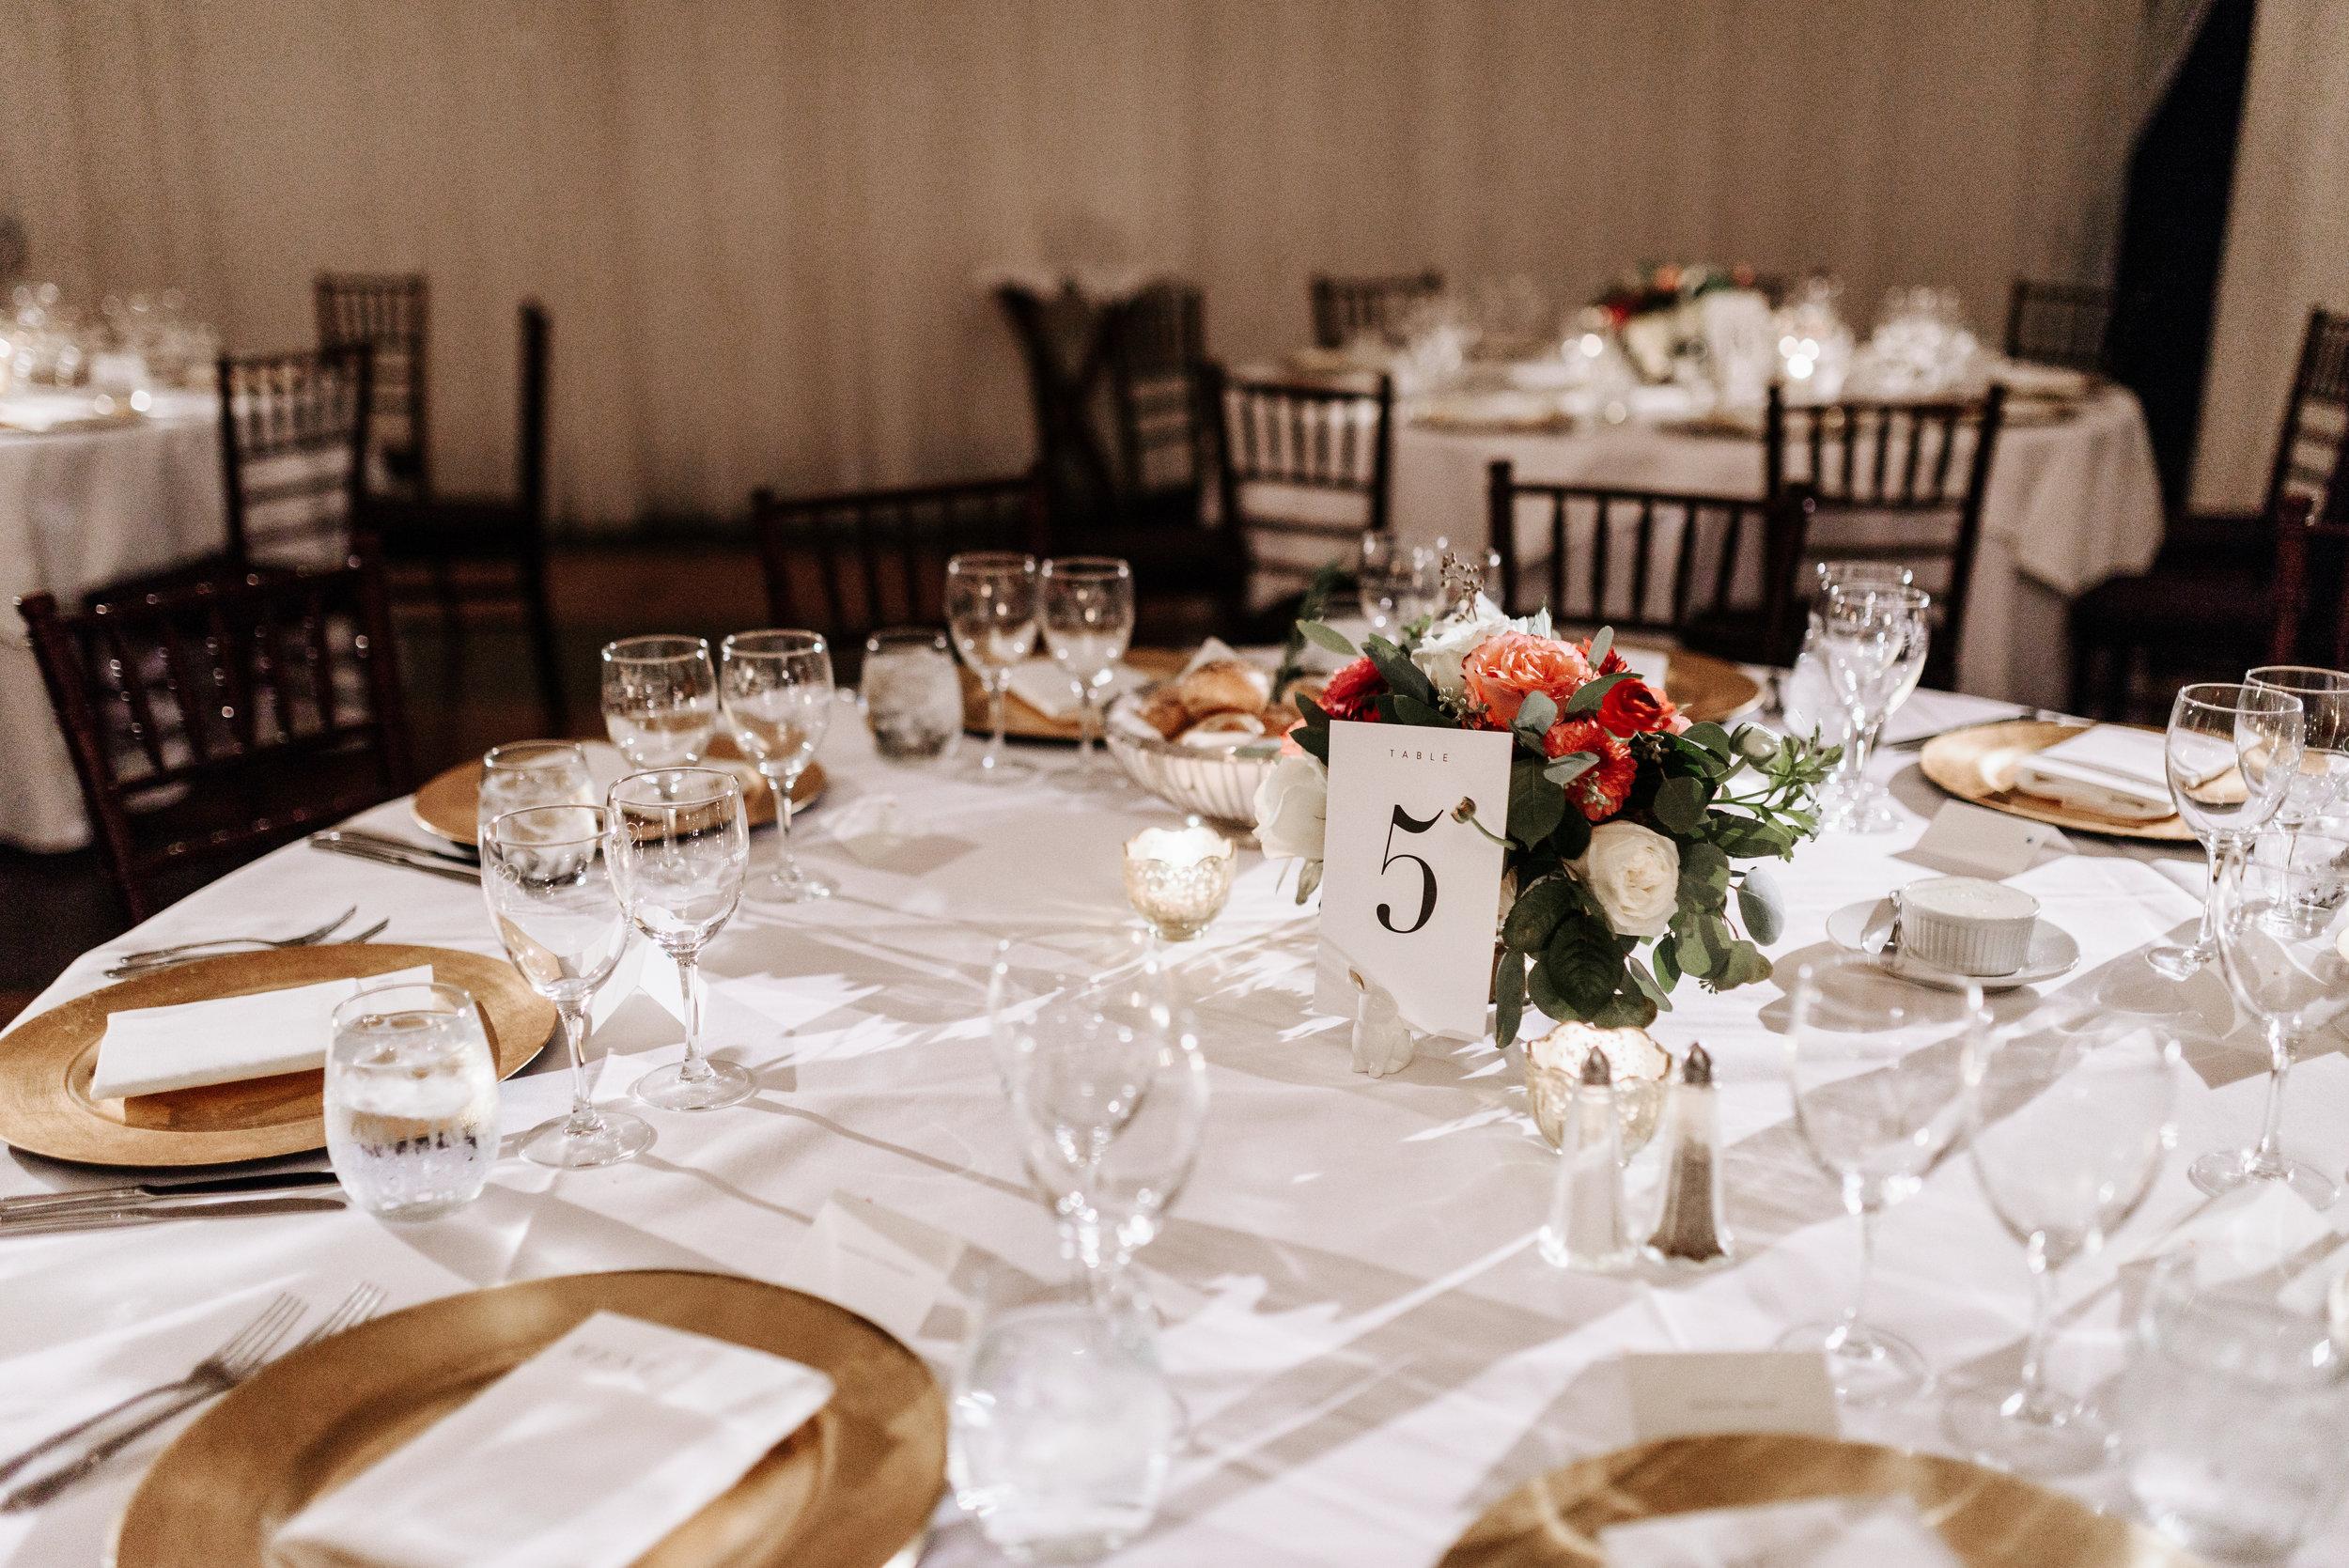 Veritas-Vineyards-and-Winery-Wedding-Photography-Afton-Virginia-Yasmin-Seth-Photography-by-V-9797.jpg